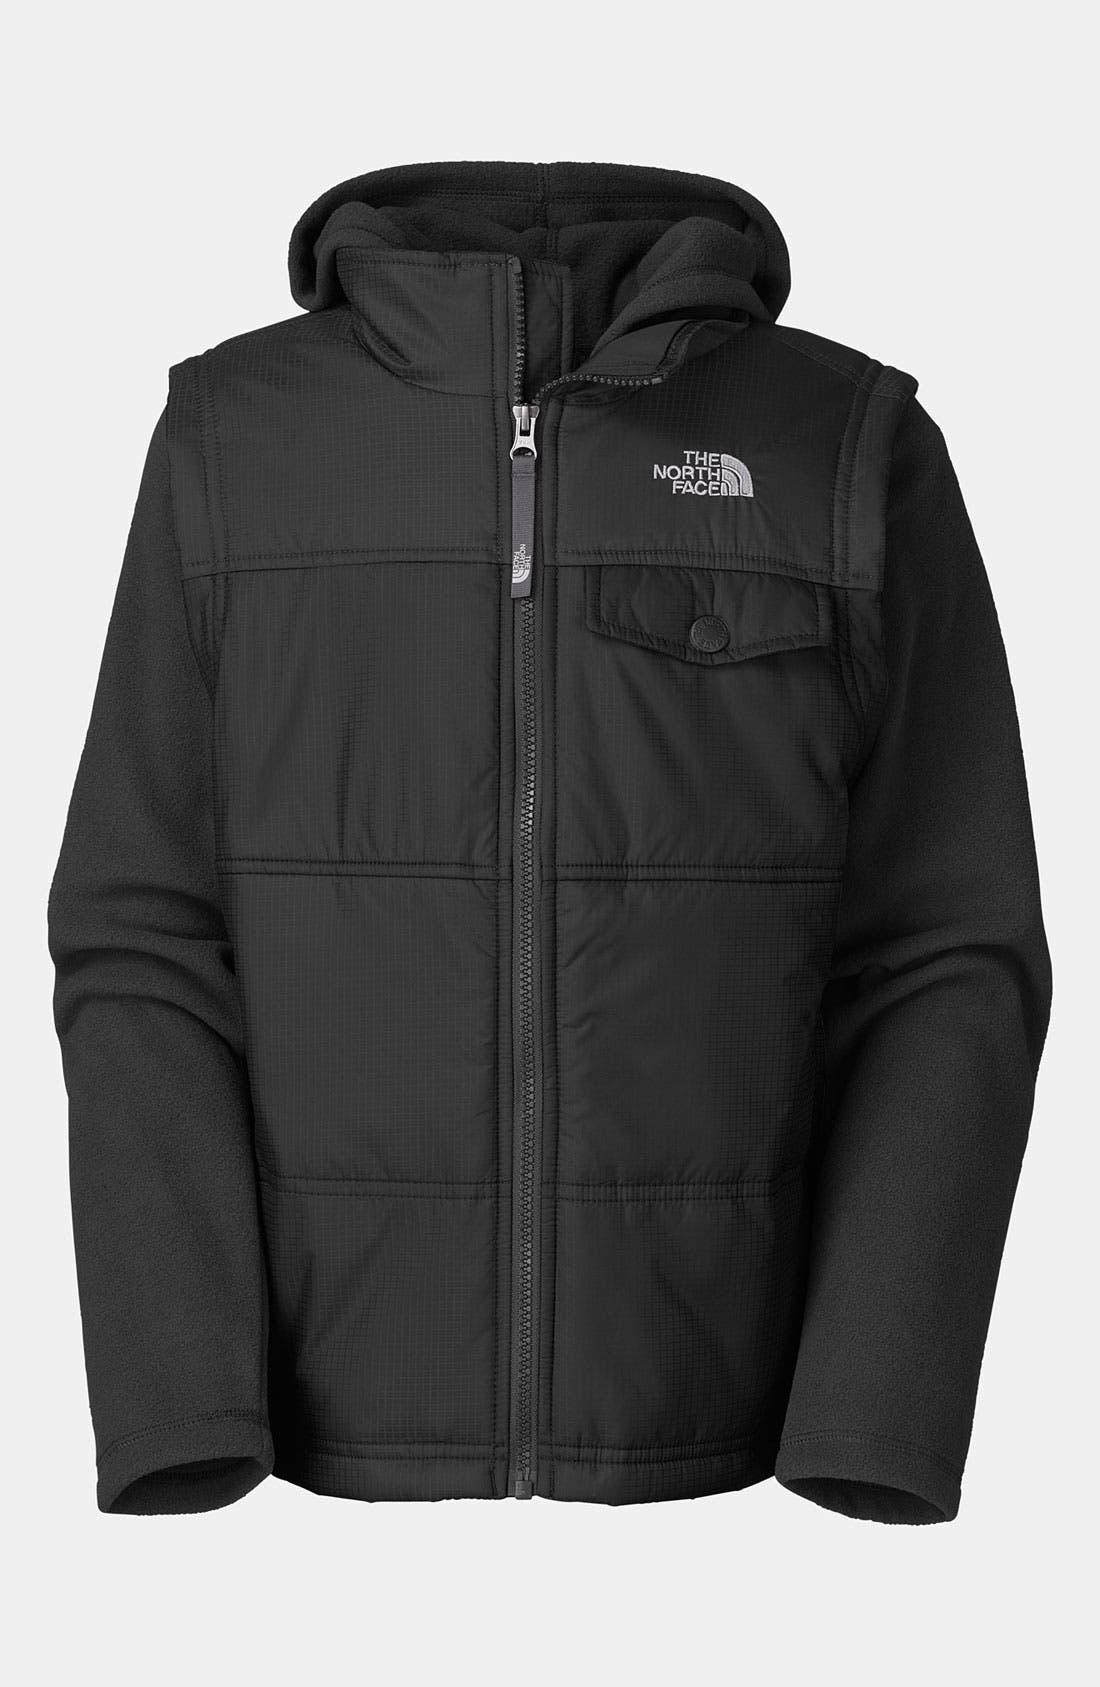 Main Image - The North Face 'Vesty Vest' Hooded Fleece Jacket (Big Boys)